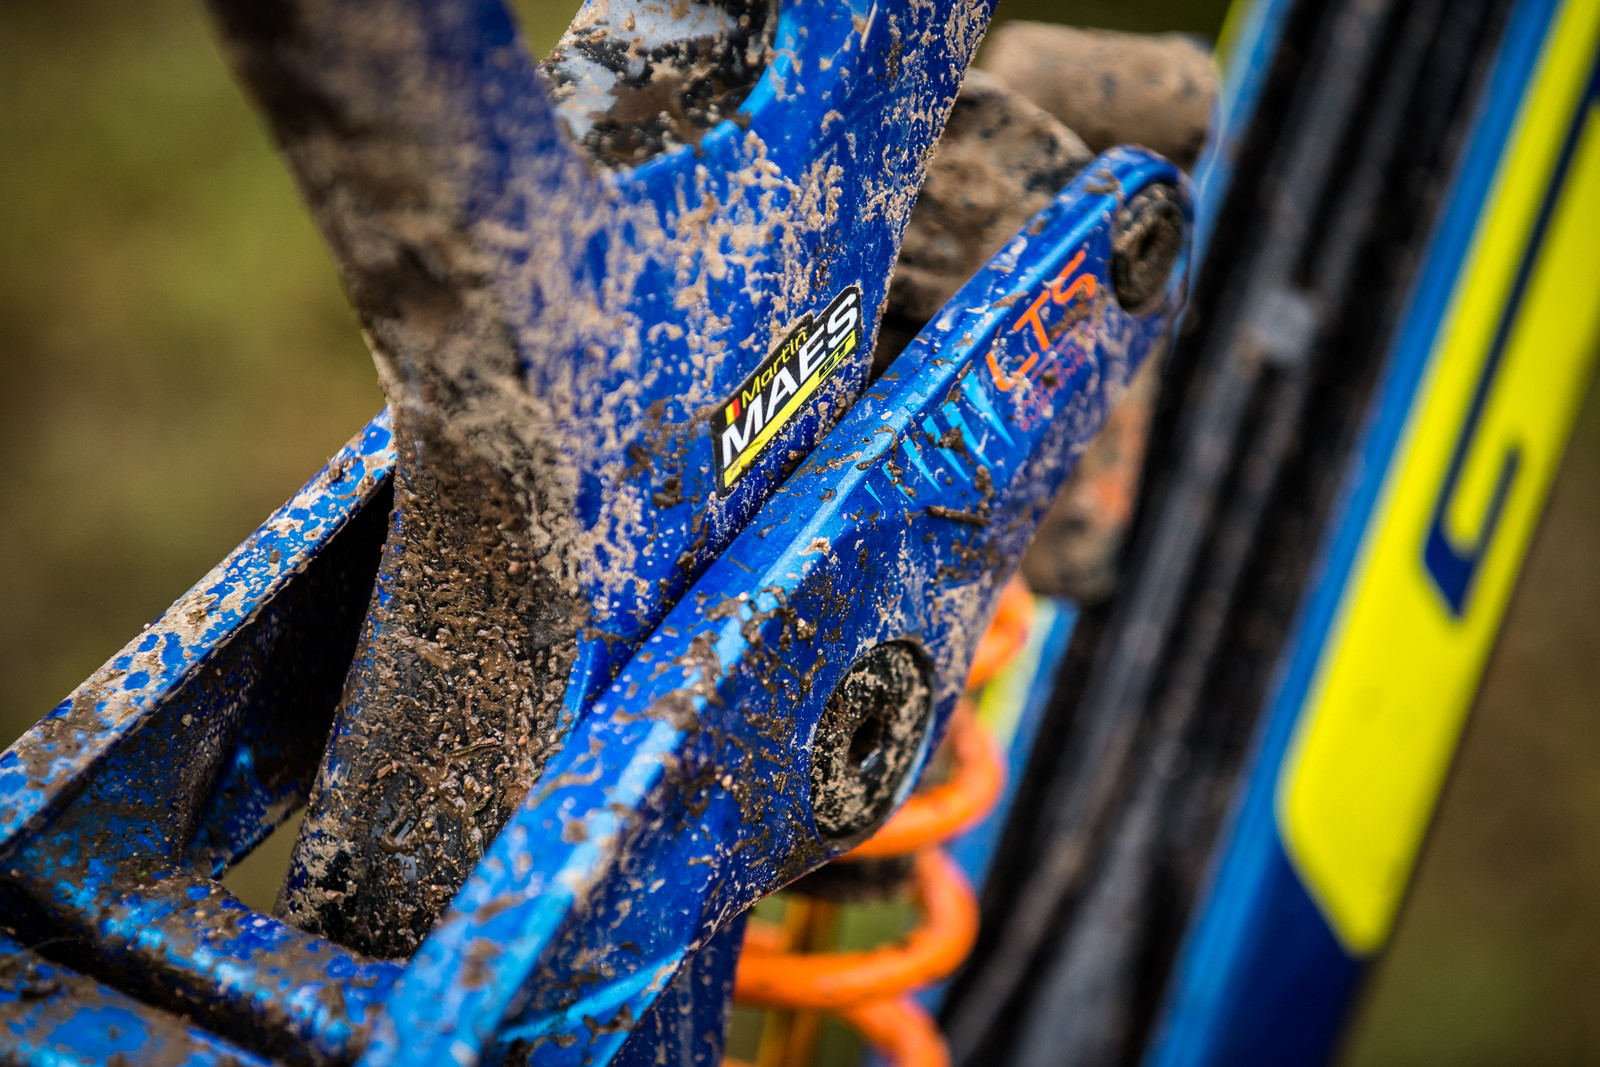 Da Winnah - WINNING BIKE - Martin Maes' GT Fury - Mountain Biking Pictures - Vital MTB